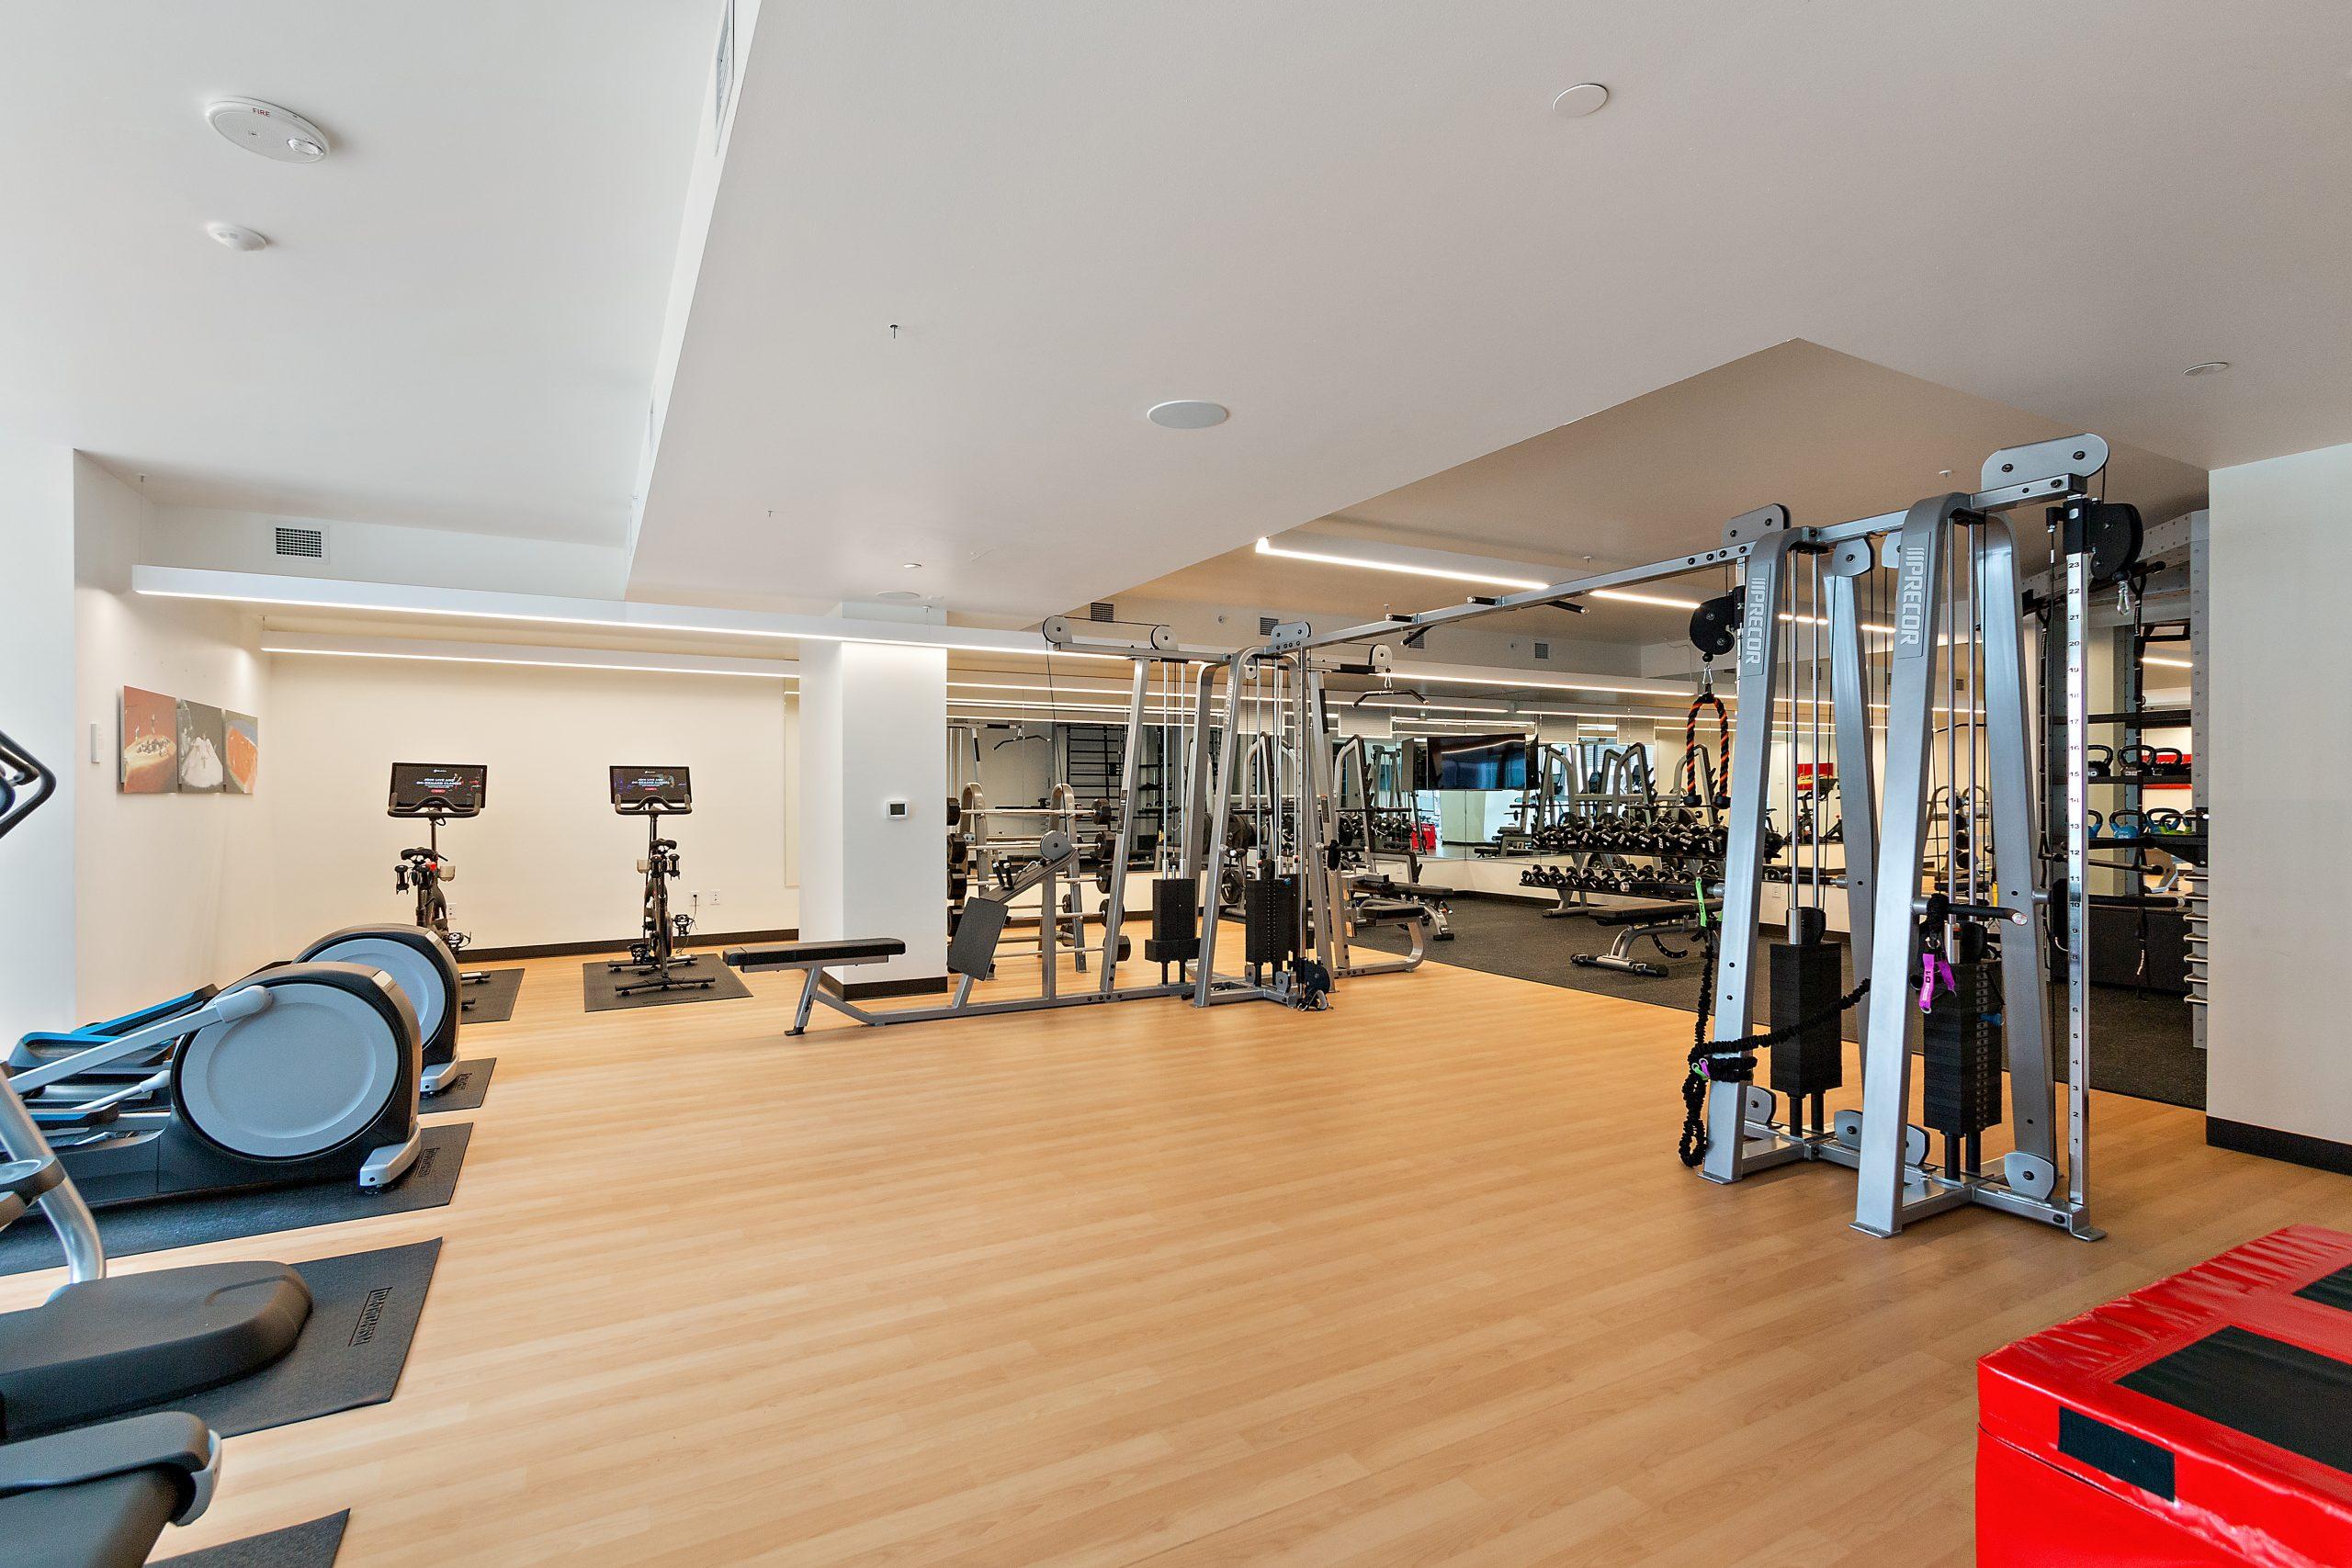 41-Gym